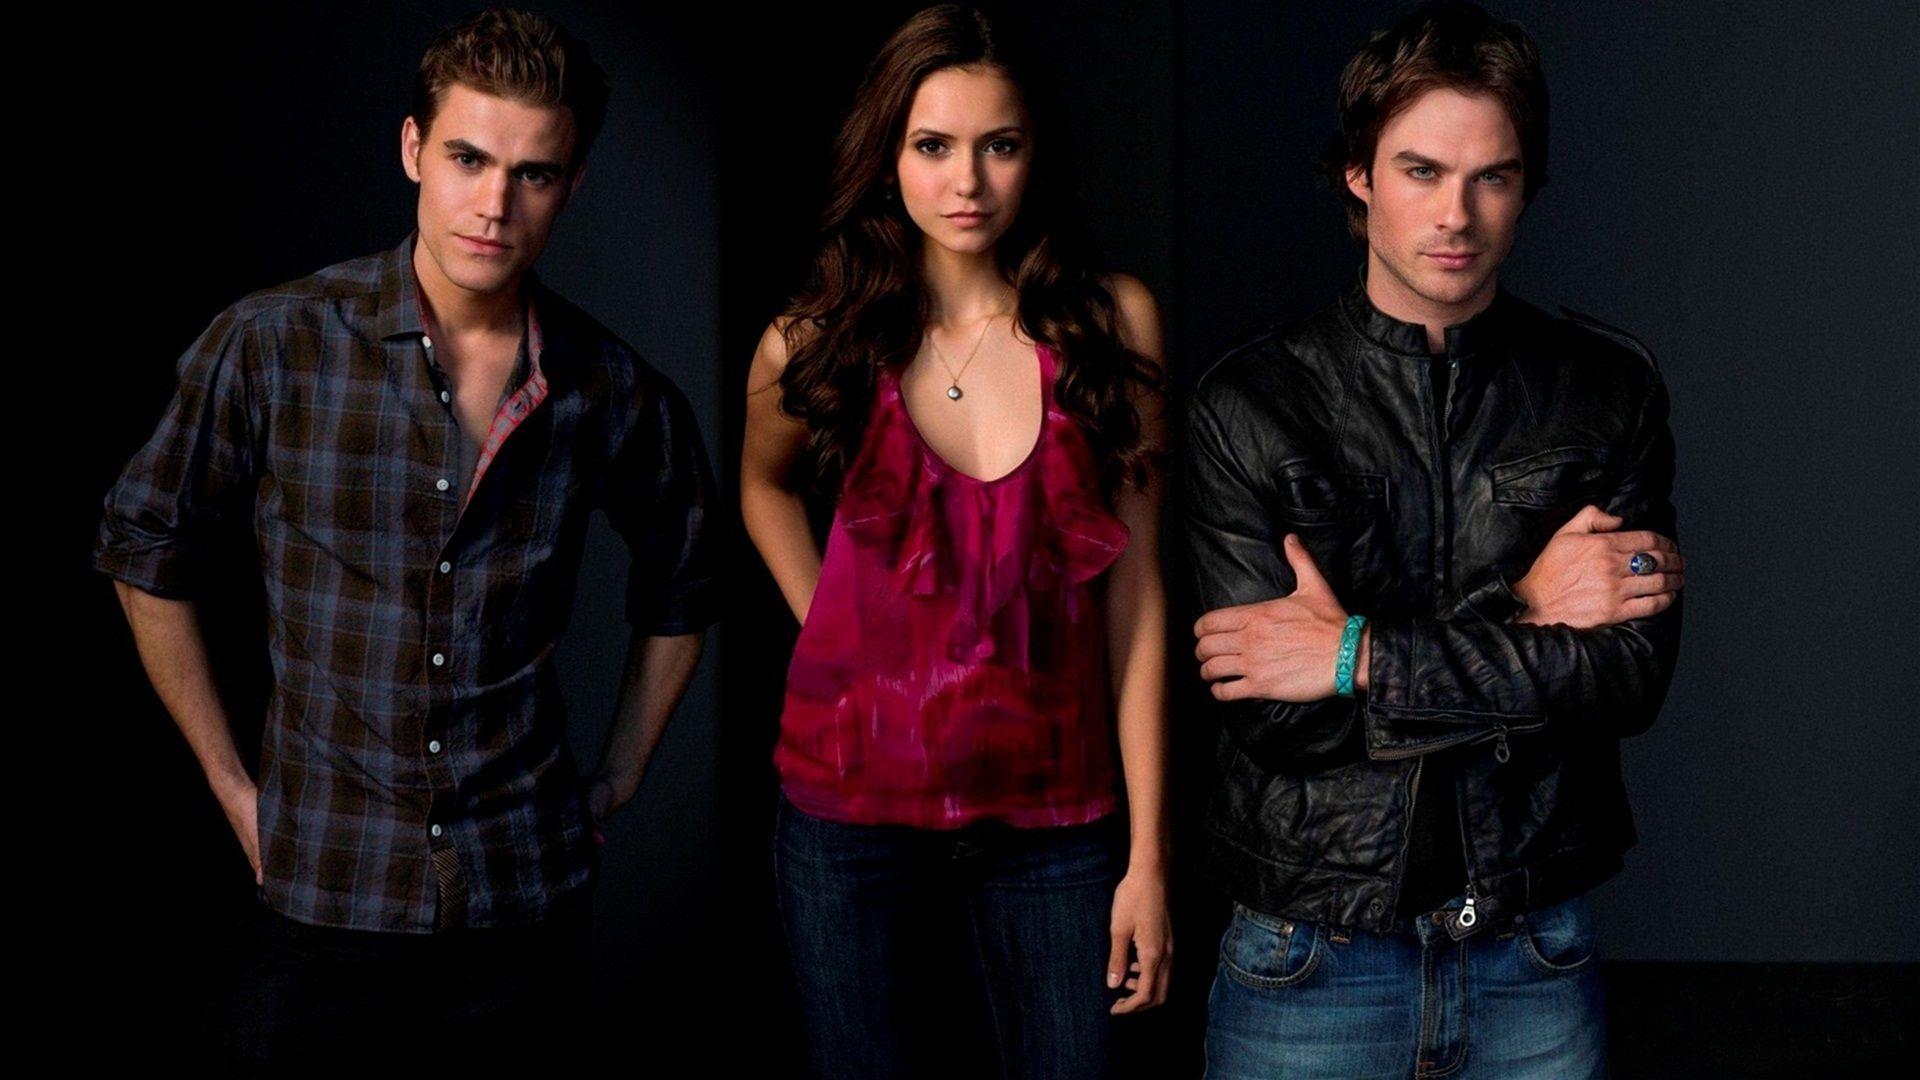 Vampire Diaries Wallpaper | The Vampire Diaries TV Show e Vampire Diaries ღ